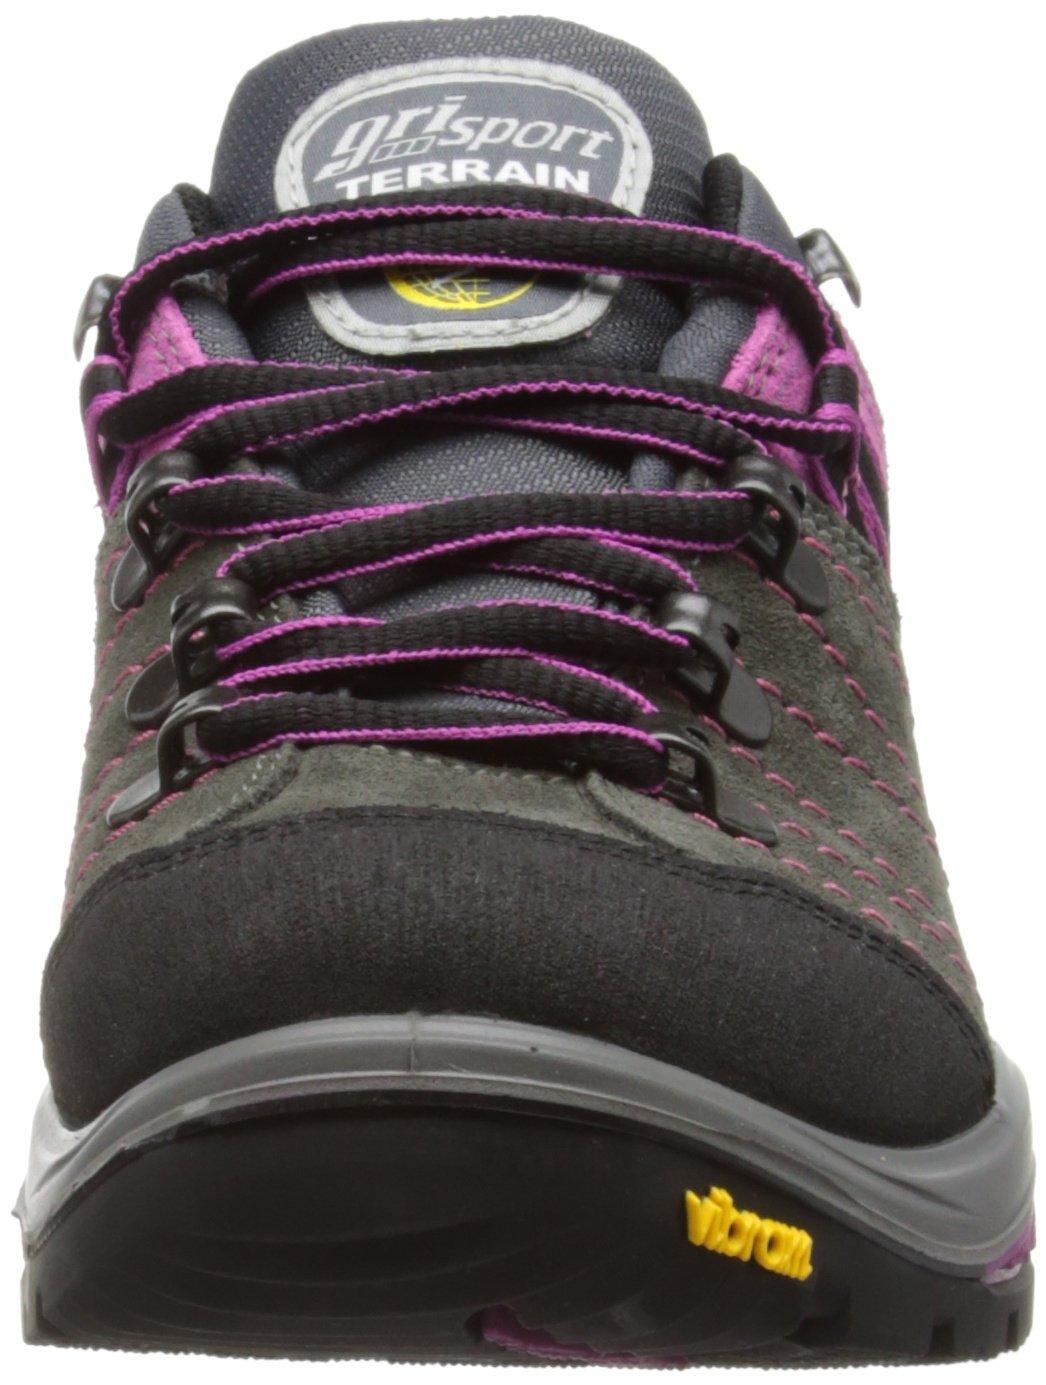 25565aa6c47 Grisport Womens Magma-Lo Hiking Shoes - UKsportsOutdoors